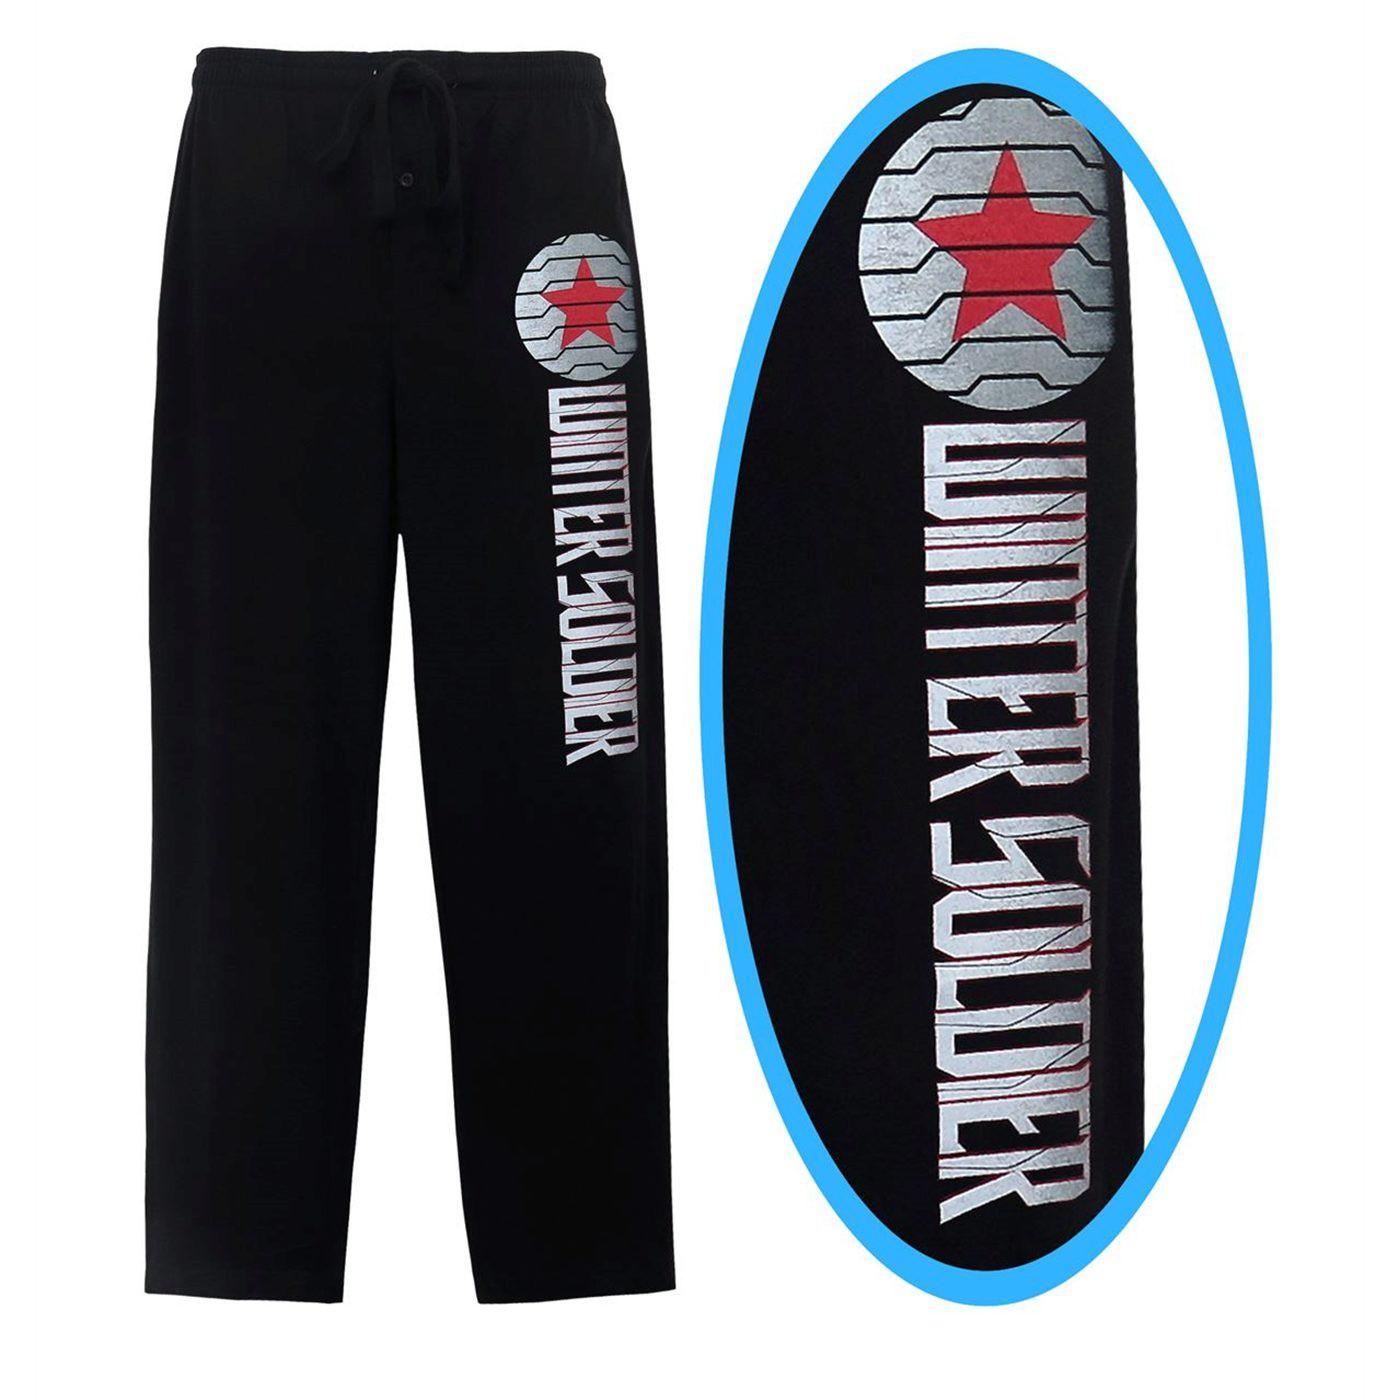 Winter Soldier Mission Report Men's Pajama Pants